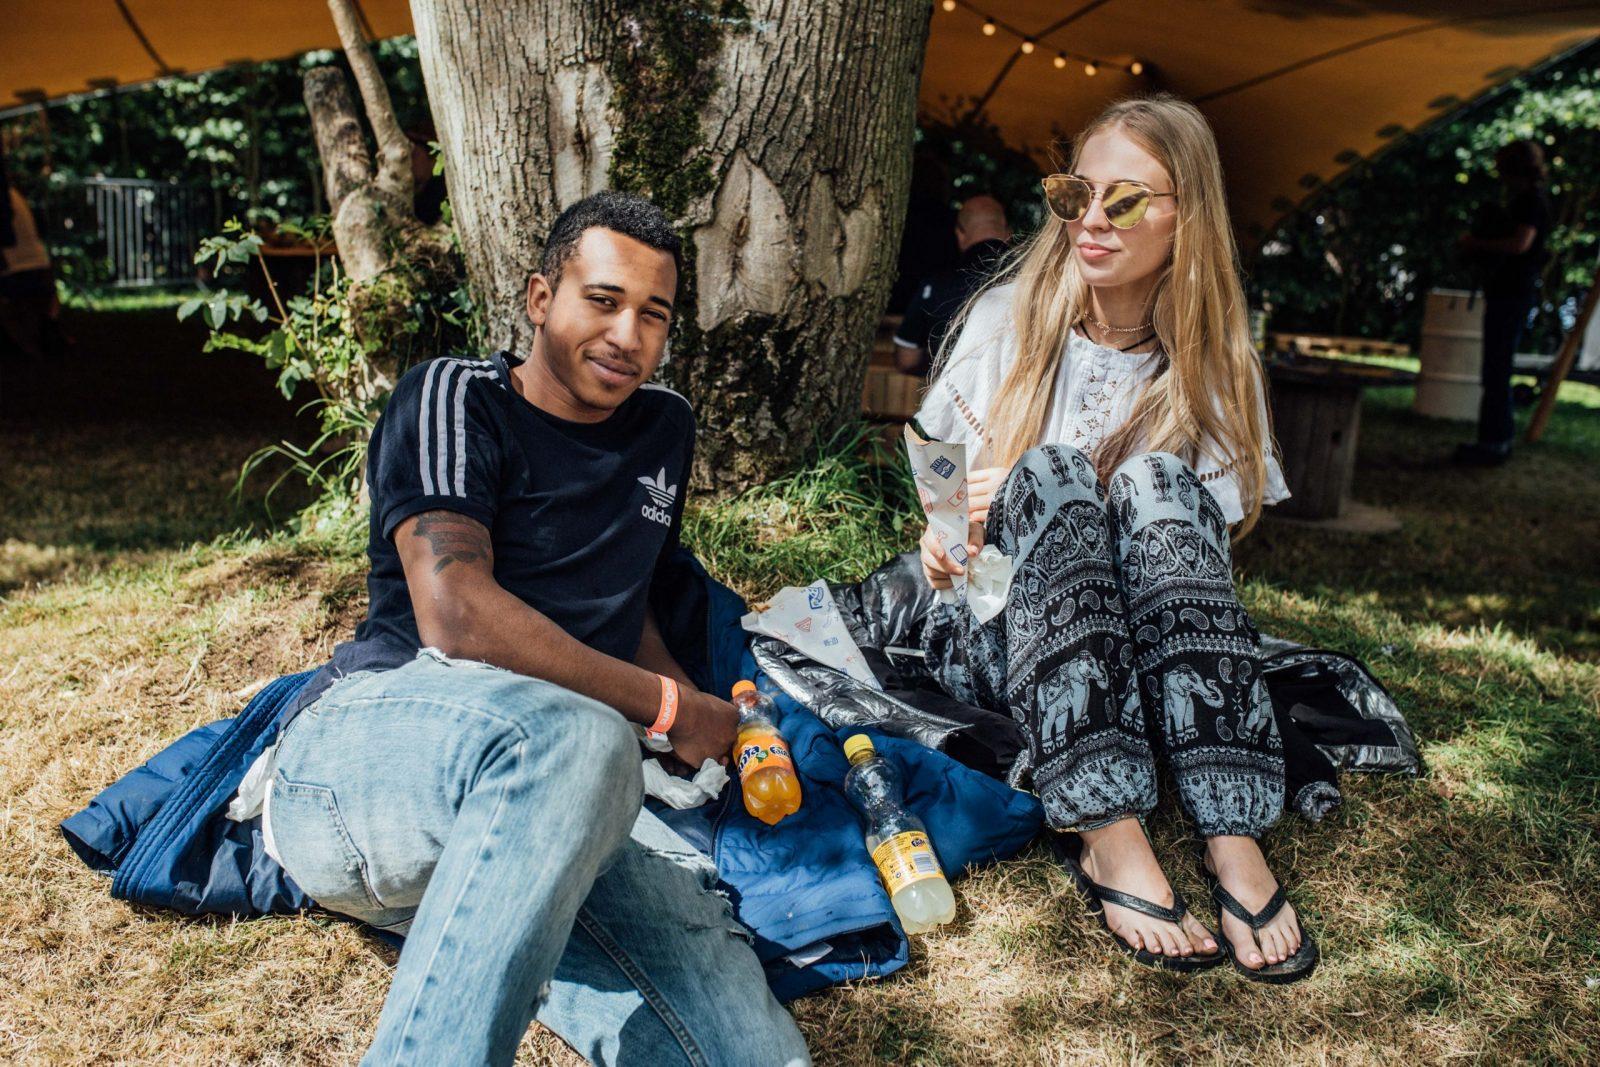 Sunflowerfest 2017- Tubbys Farm, Music, Event Photography, cmcguigan photography, Chris McGuigan Photography, Belfast Photographer